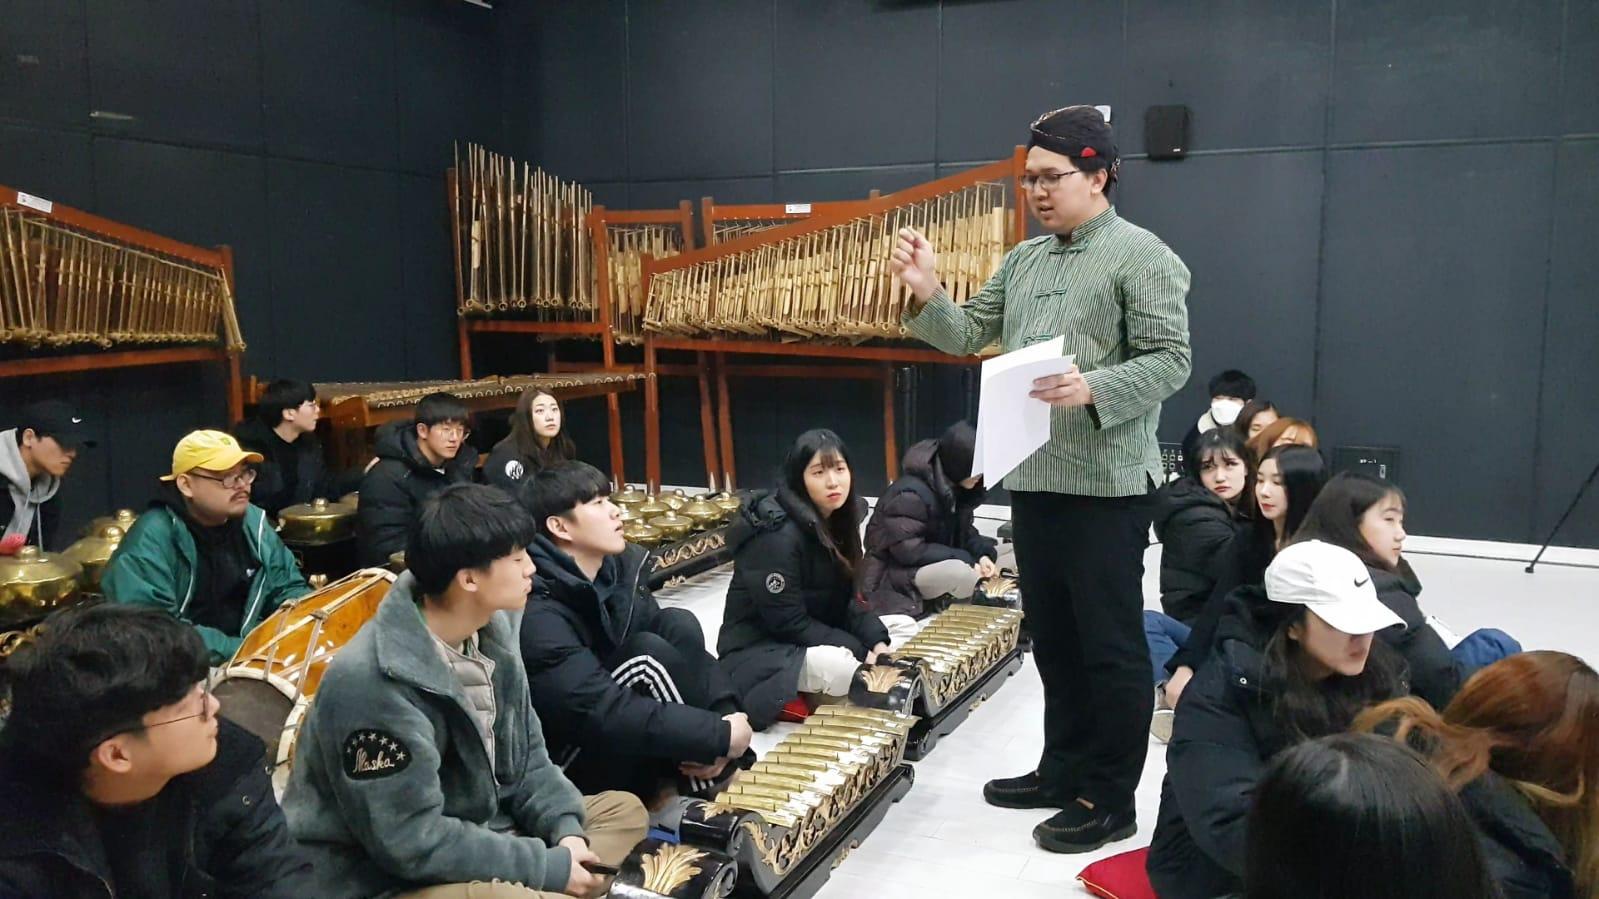 https: img-z.okeinfo.net content 2019 03 14 65 2029761 universitas-seni-di-korea-ajarkan-musik-gamelan-1cVU6blsvR.jpeg